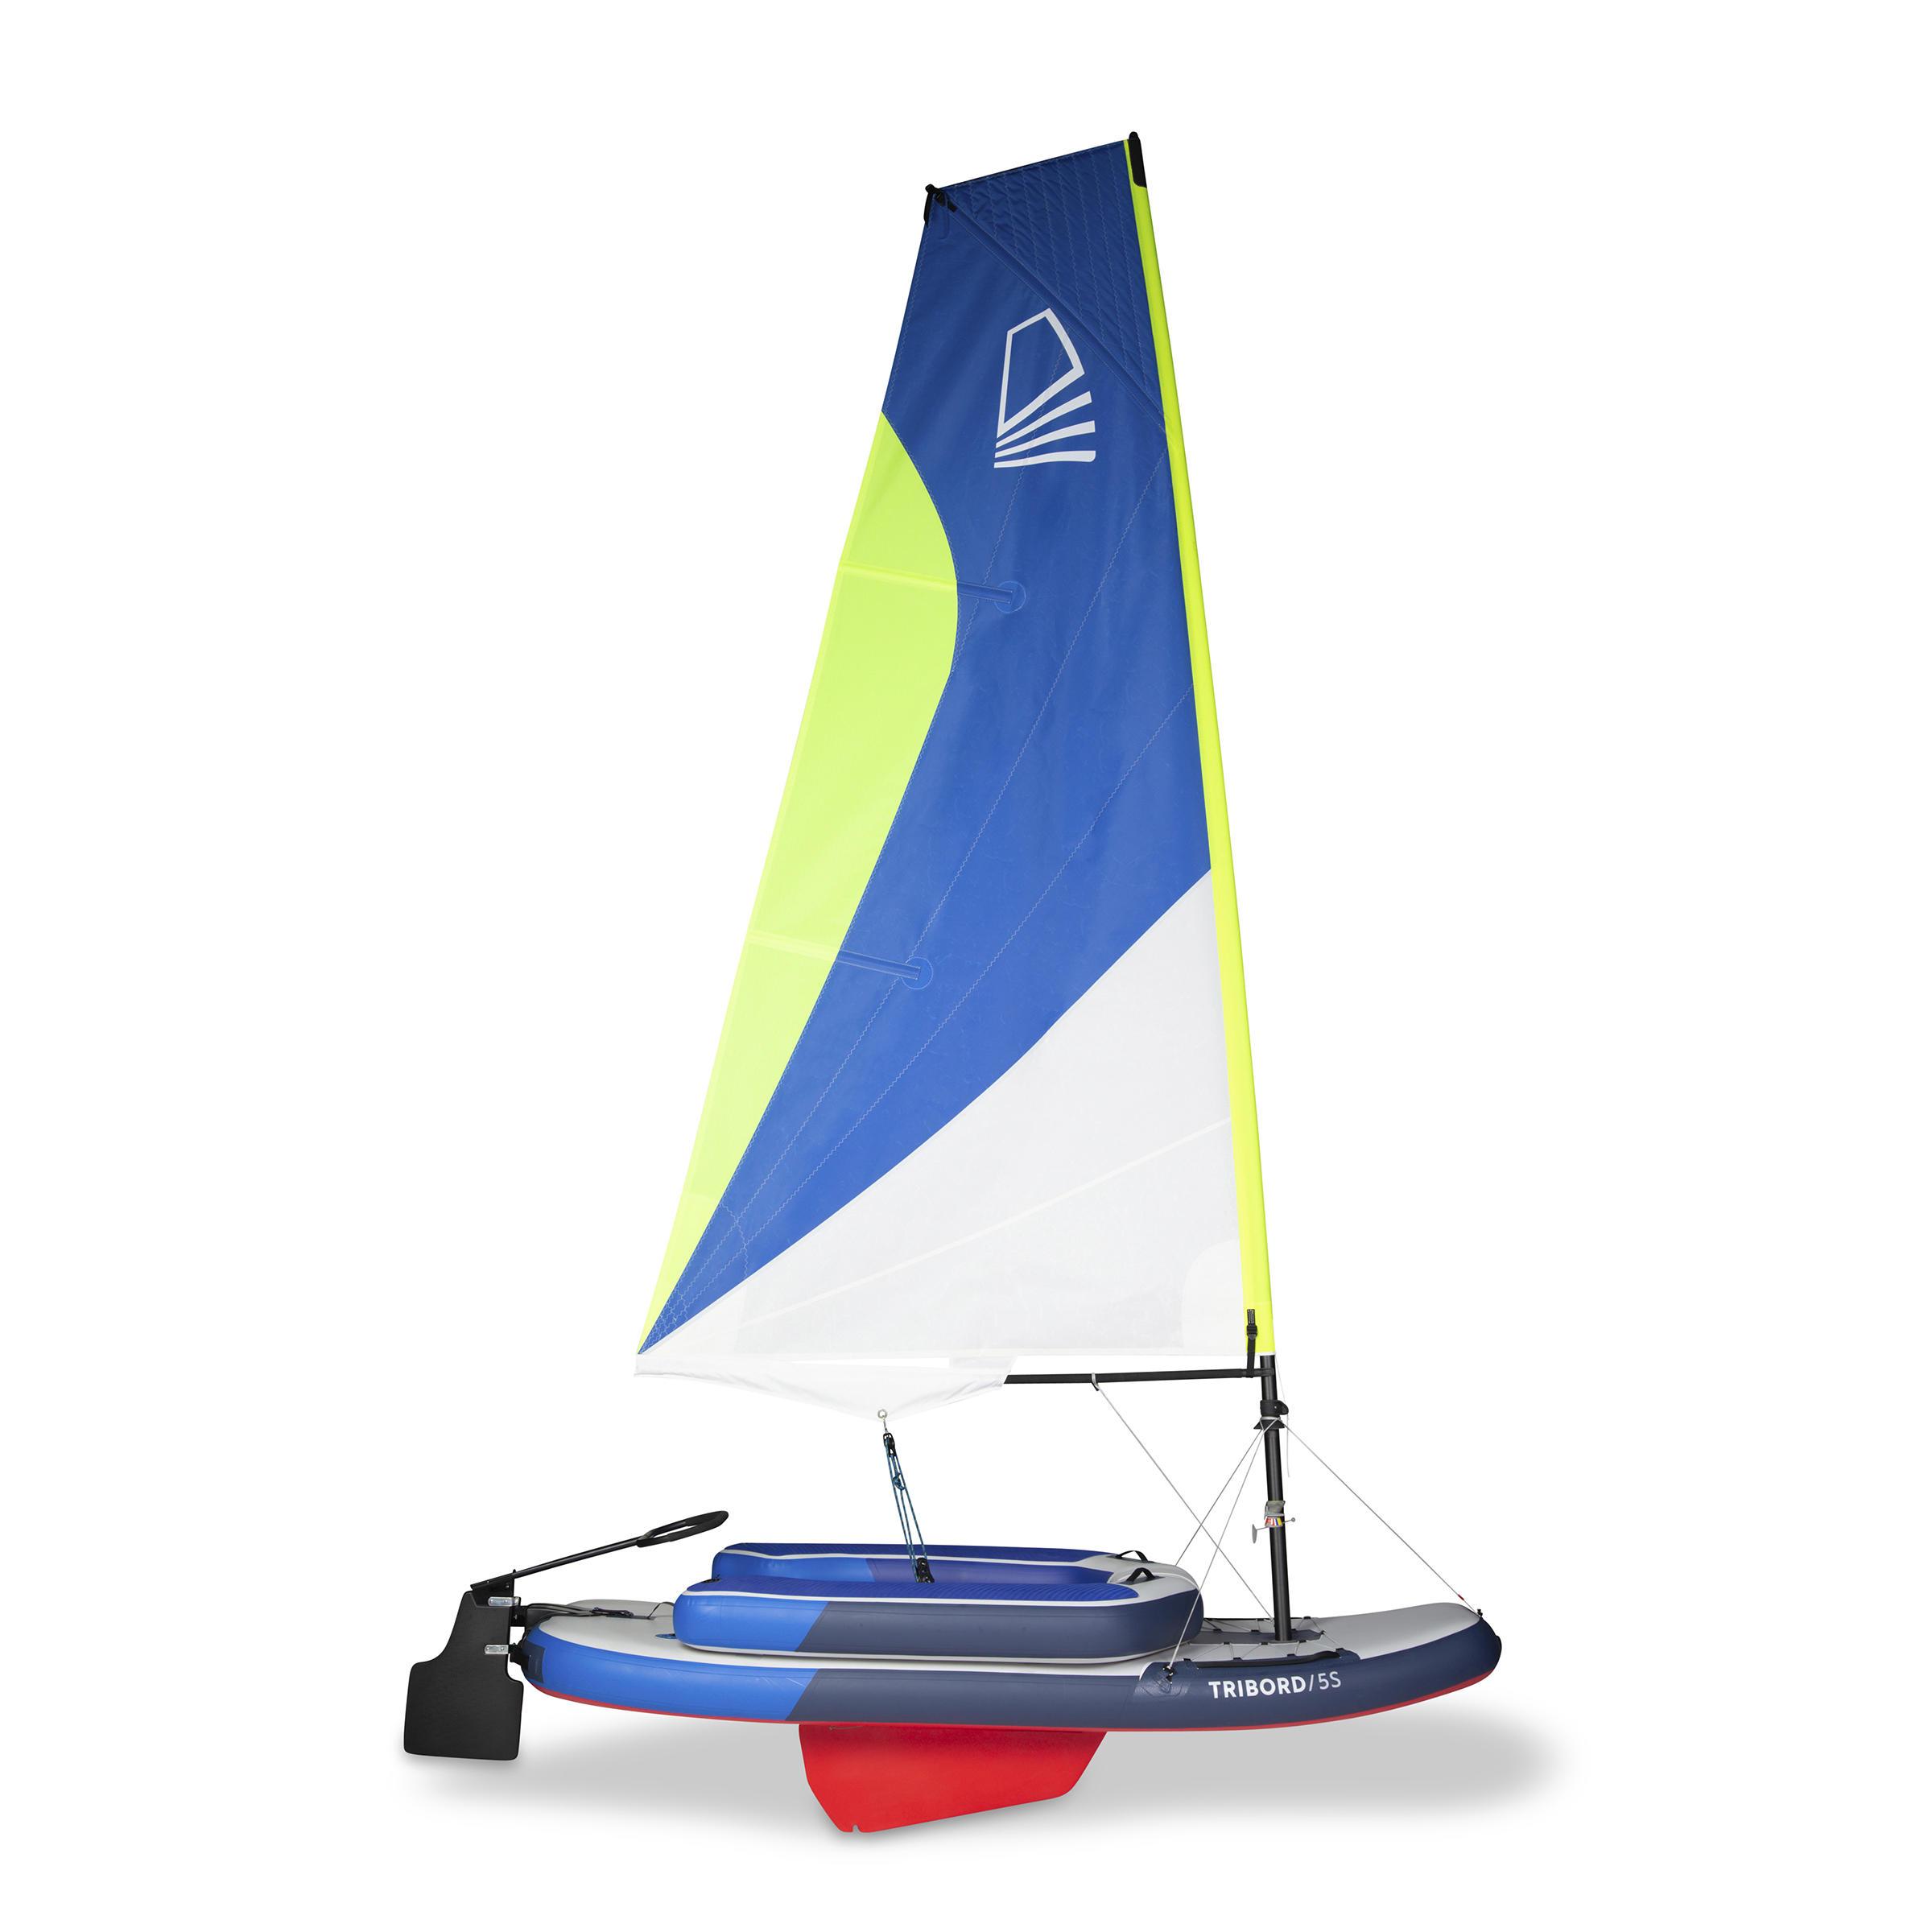 Barcă Tribord 5S